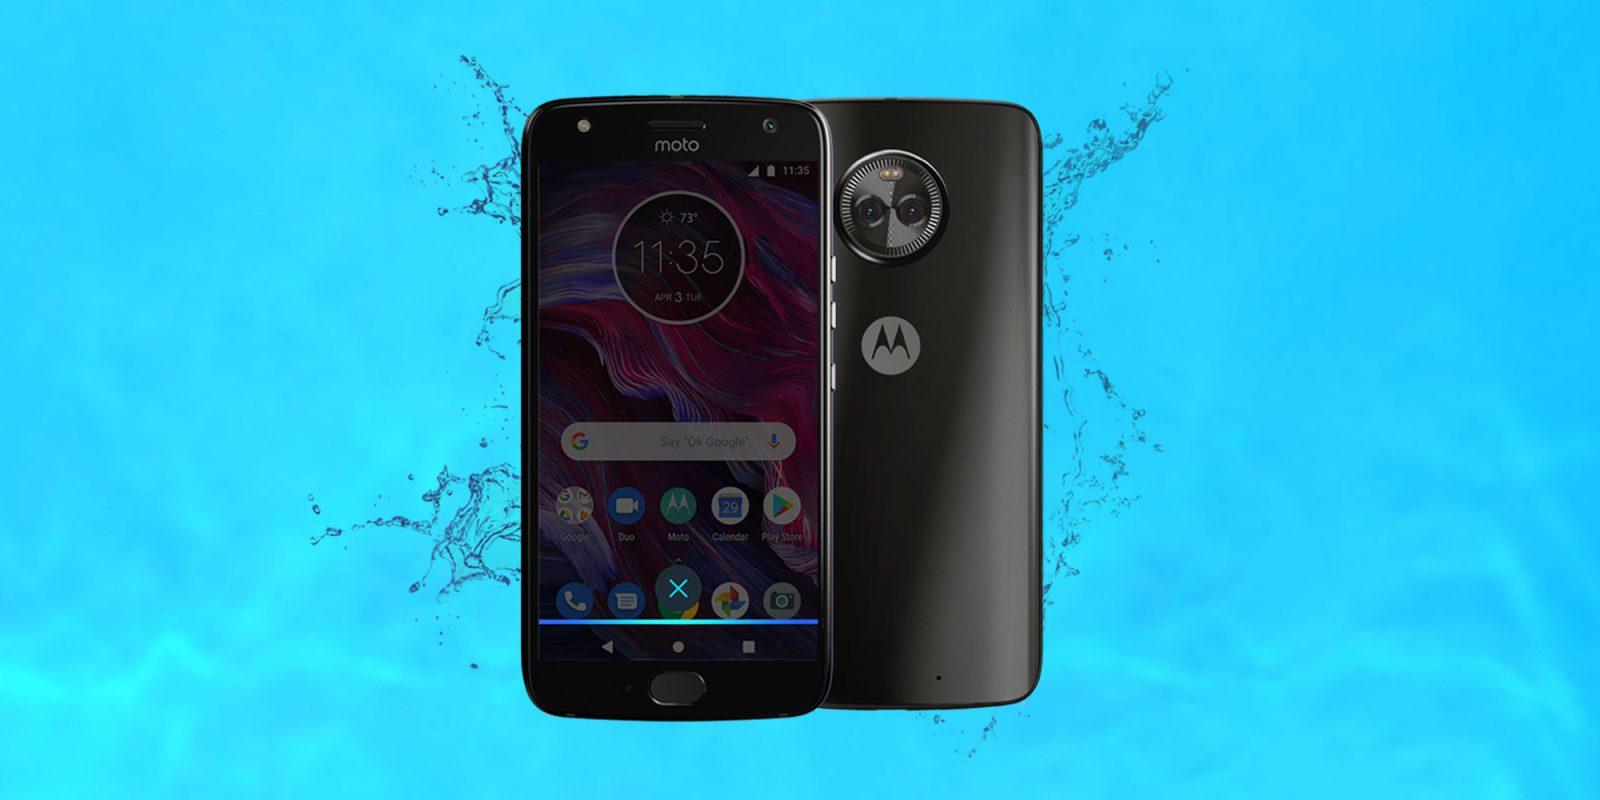 8b764985435 Motorola s Moto X4 features Alexa voice control